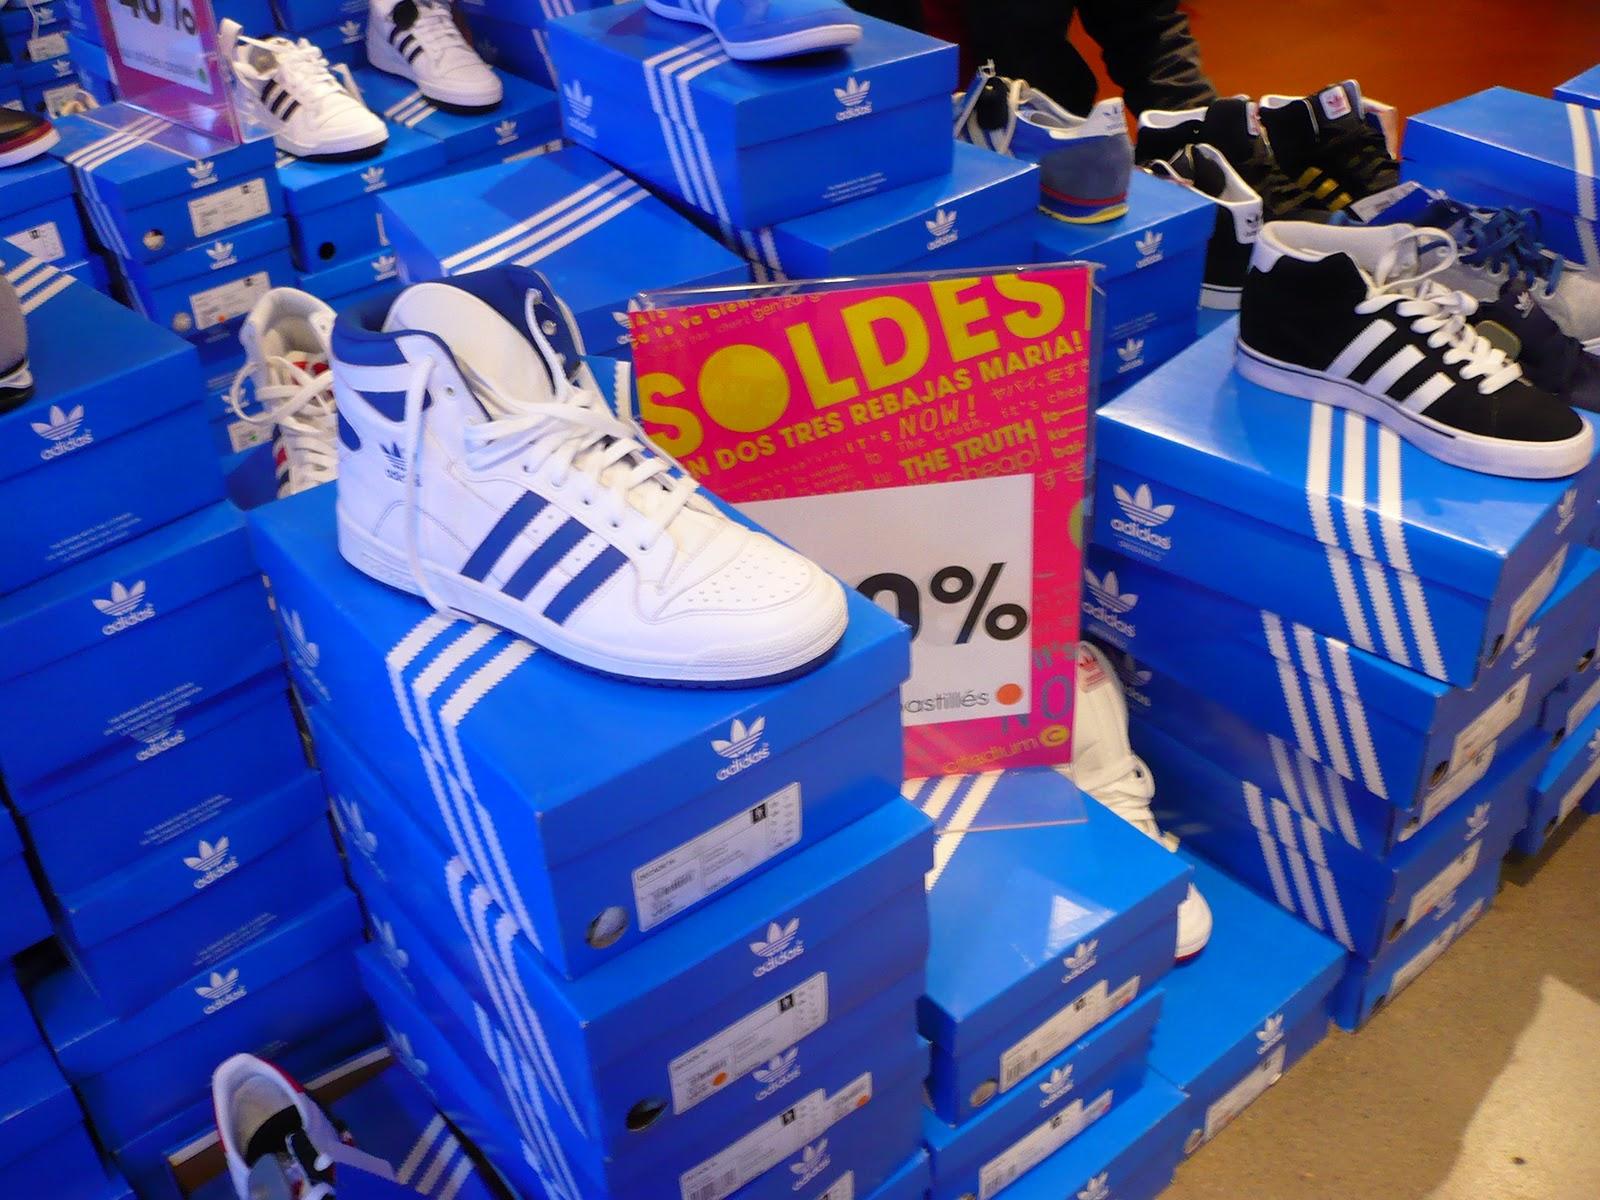 http://4.bp.blogspot.com/-Q_l7HP6ctsI/TxCobK8YqzI/AAAAAAAACN4/qwTLw7mRllE/s1600/1sneakers-baskets-montantes-adidas-decade-HI-citadium-2012-blacnhes-bandes-bleues.JPG